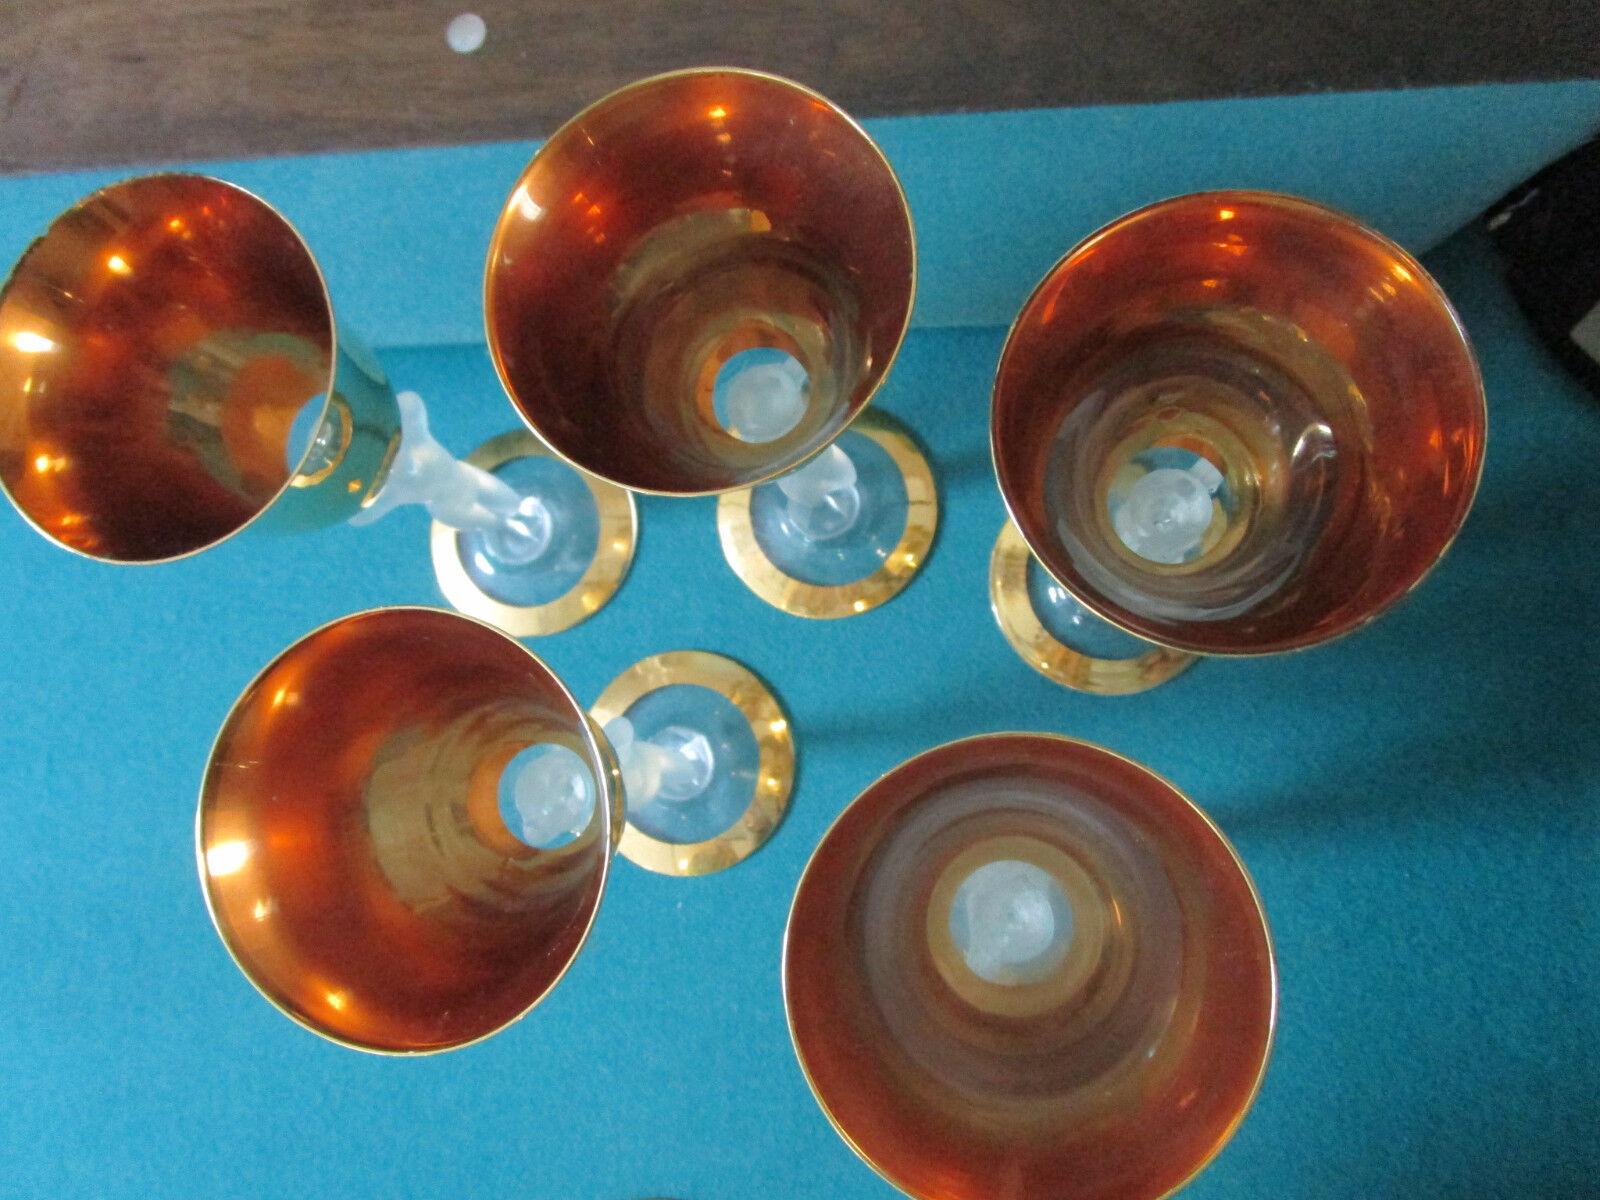 Bayal crystalware - 10 caryatid stemware glasses